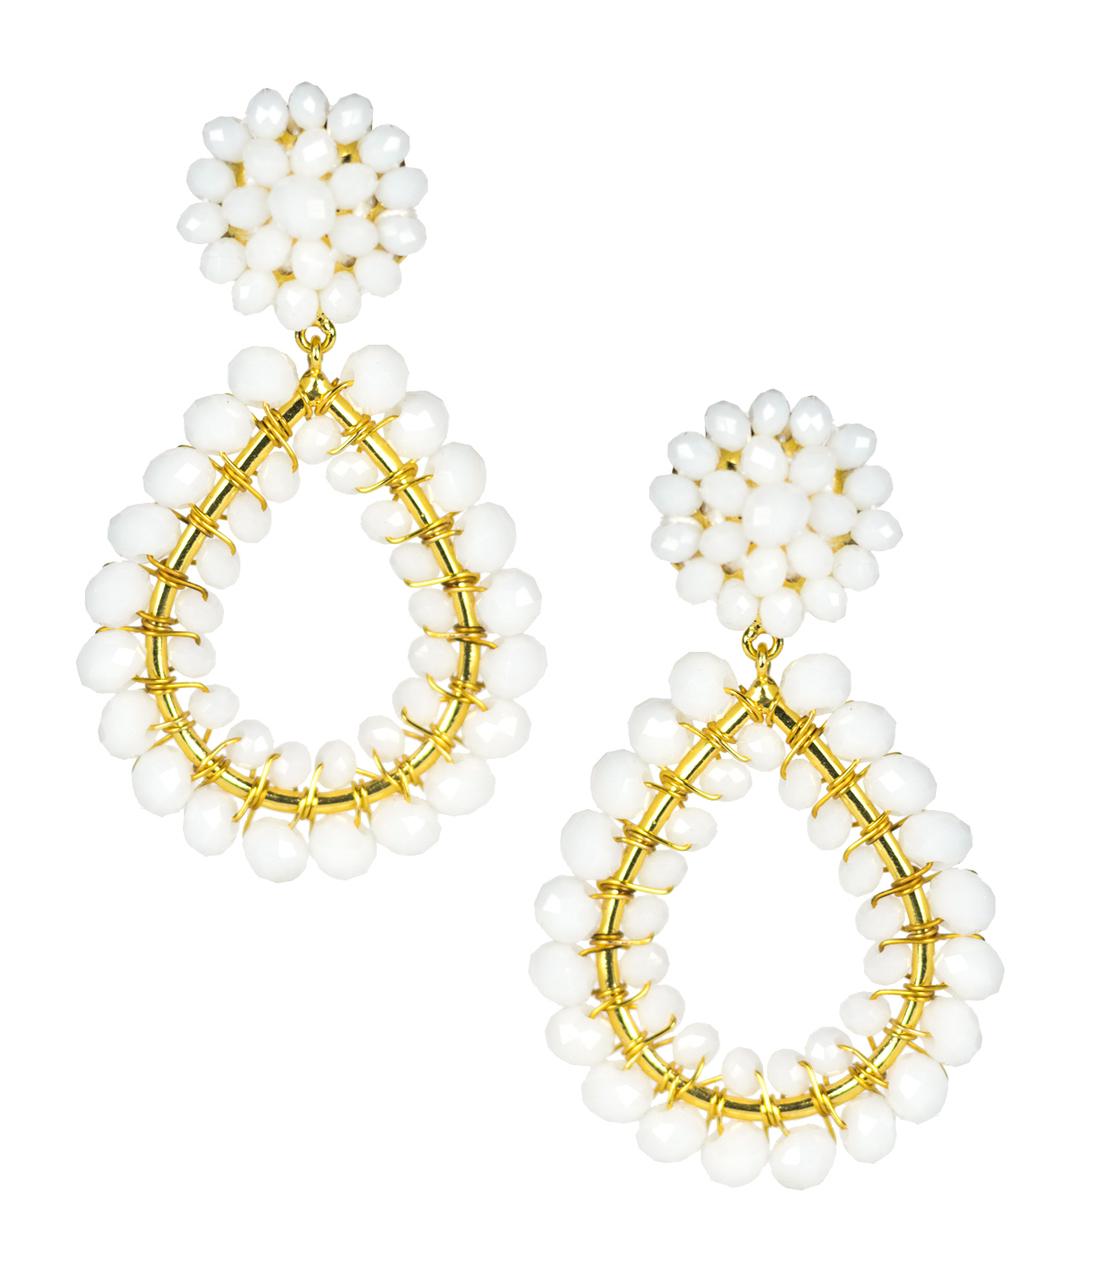 Margo White Earrings by LISI LERCH